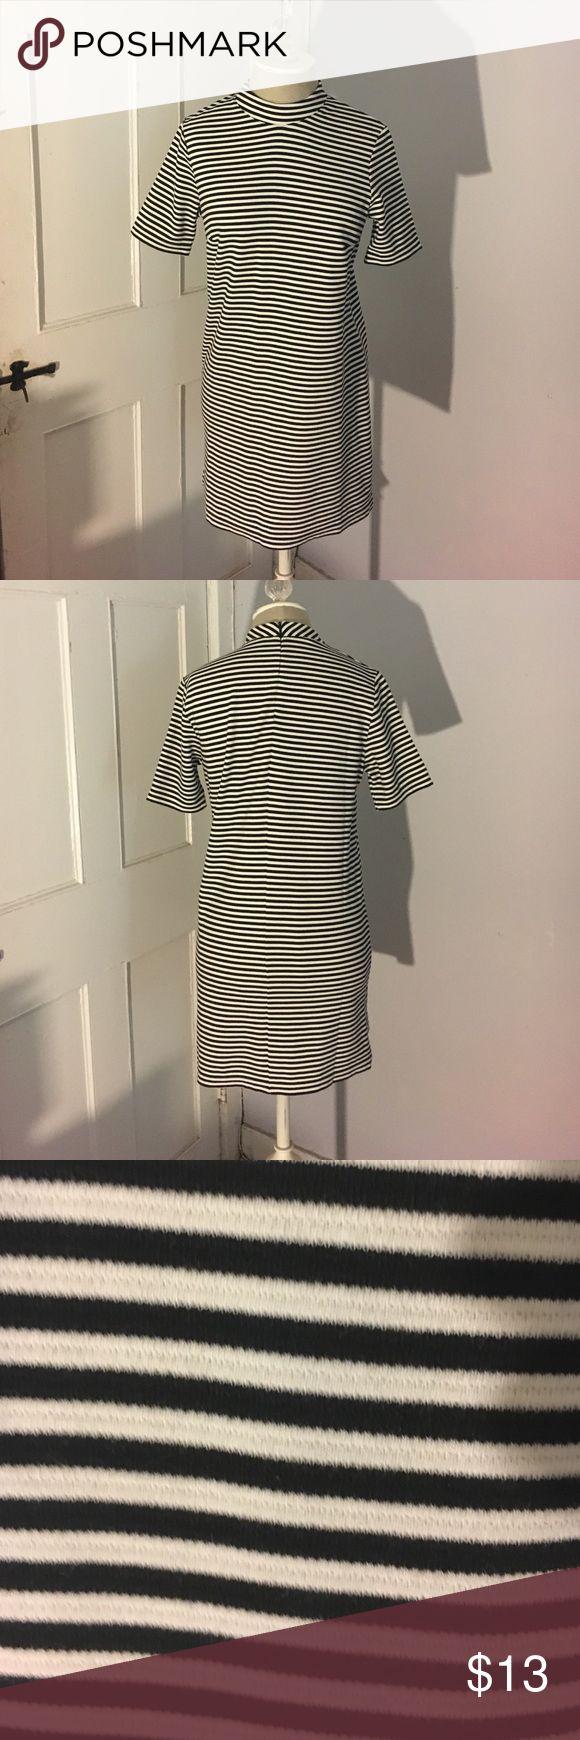 Striped mini dress Black and white striped mini dress. Zipper in back. High neckline. Forever 21 Dresses Mini